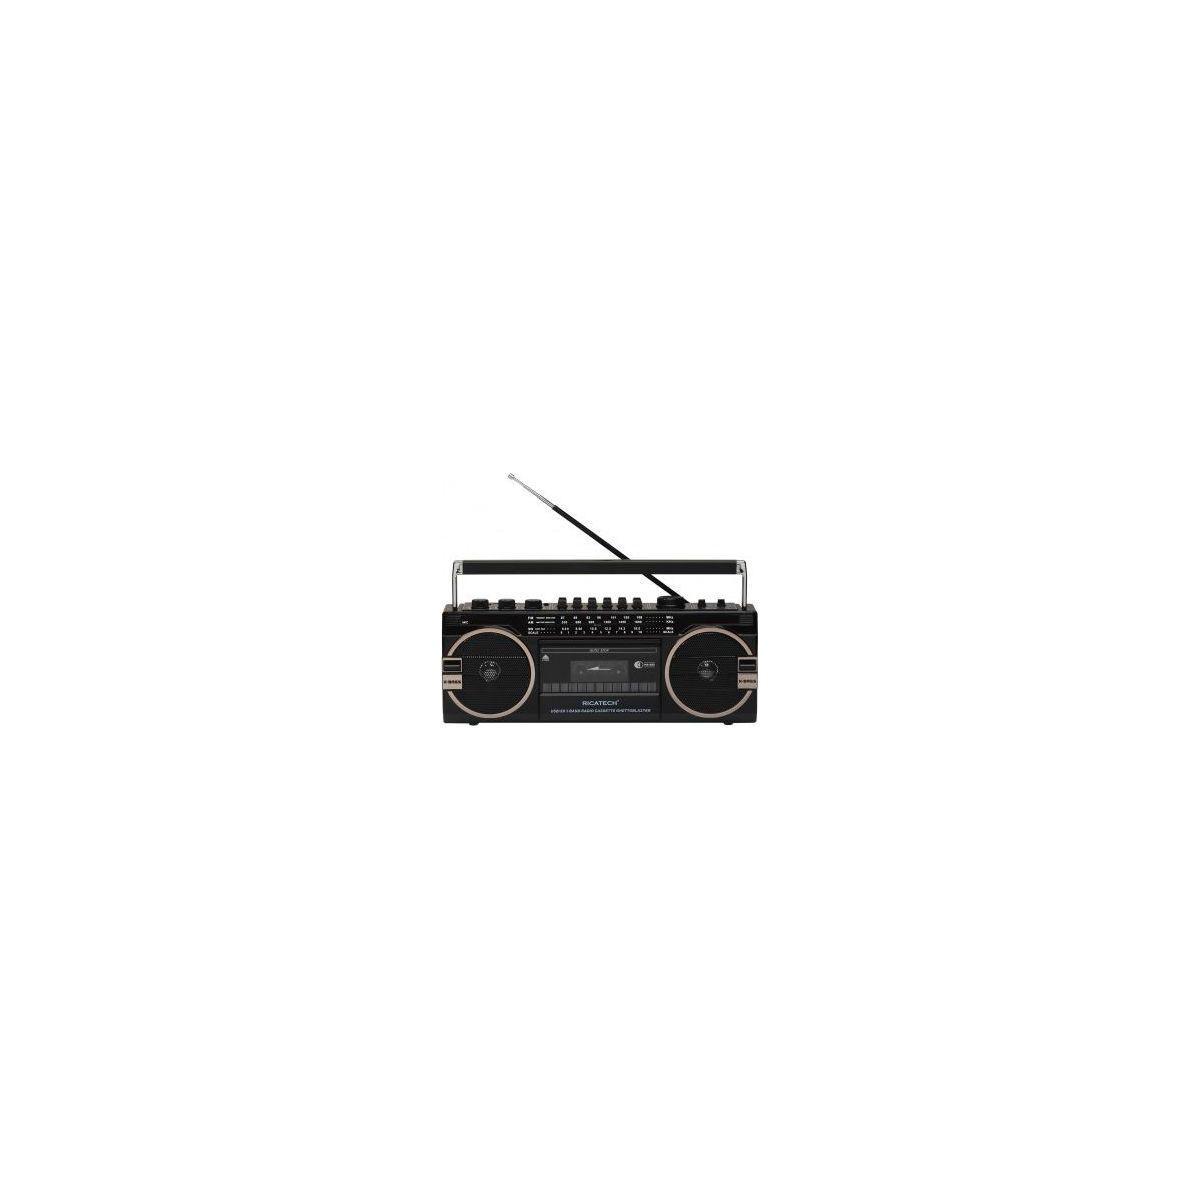 Radio analogique ricatech pr1980 ghettoblaster - livraison offerte : code liv (photo)